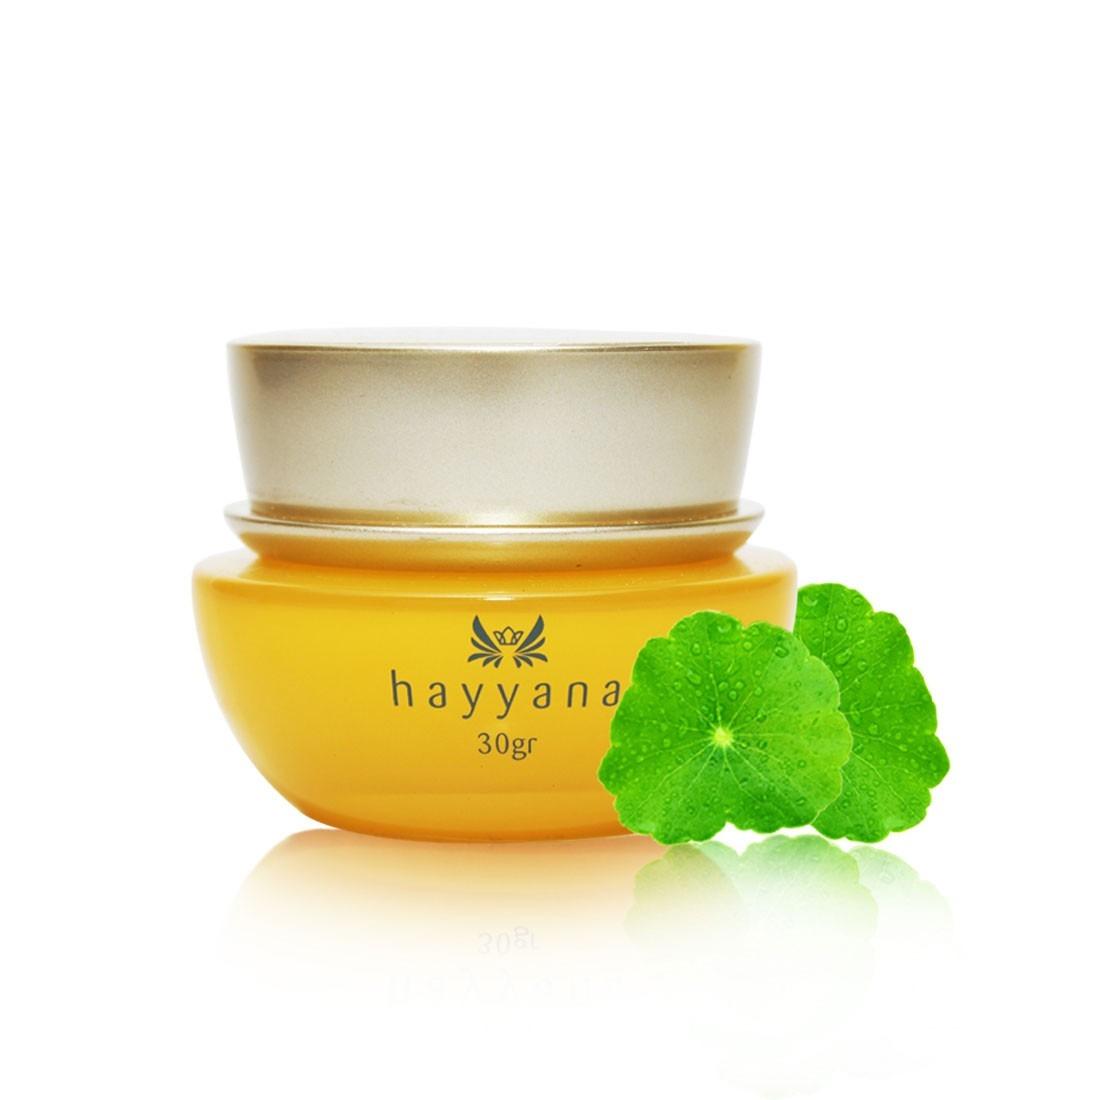 Hayyana  Royal Golden Cocoon Rejuvenation Cream